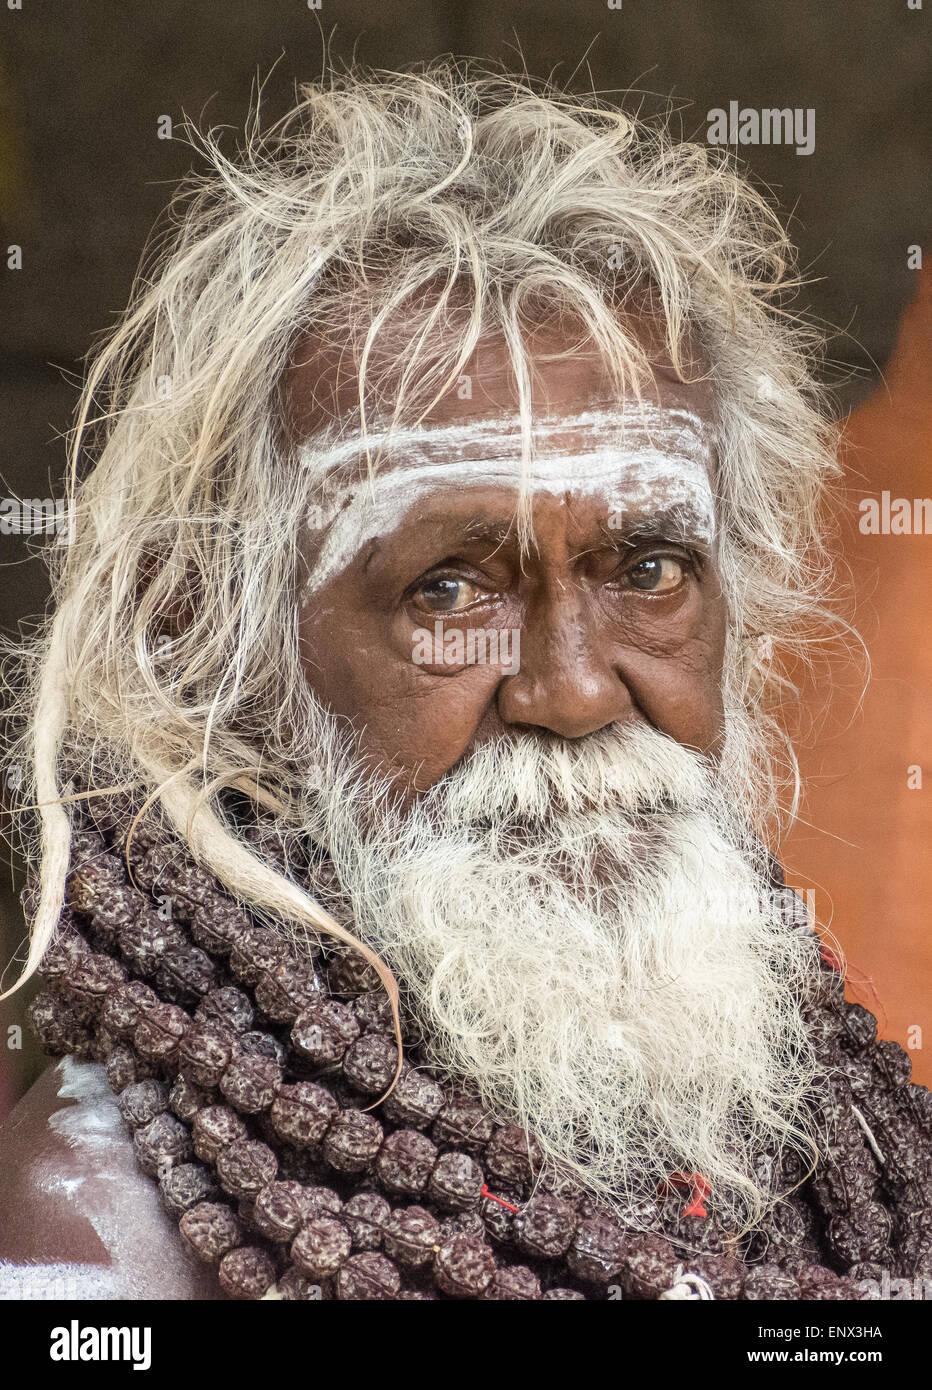 Portrait of a sadhu at the Sri Ramana Ashram in Tiruvannamalai, India - Stock Image